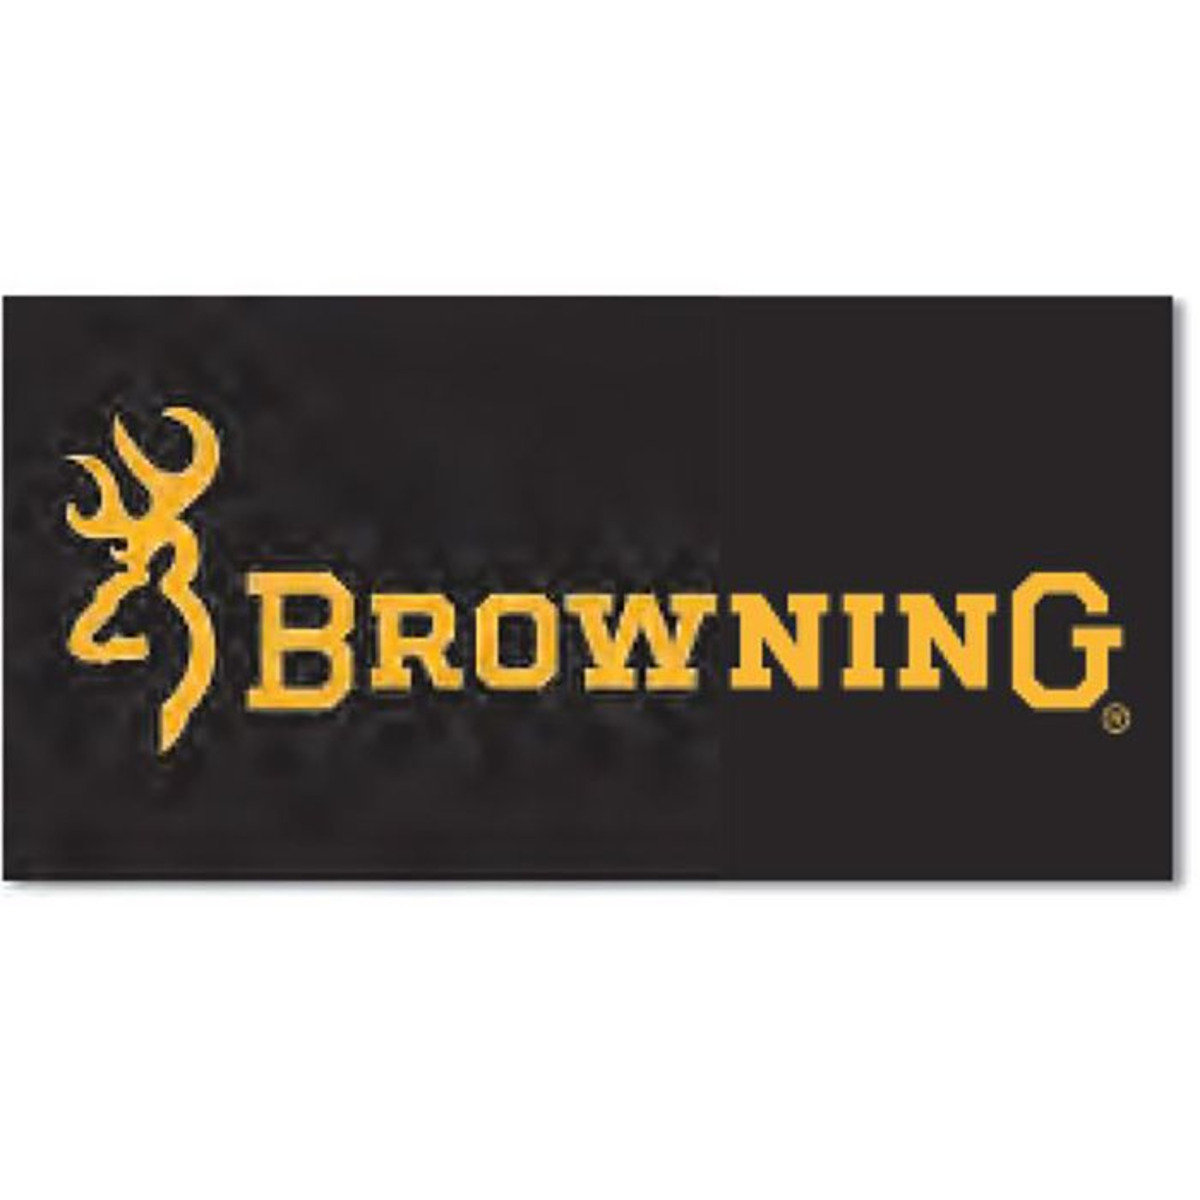 Browning Browning Sticker - 15 cm x 7.5 cm